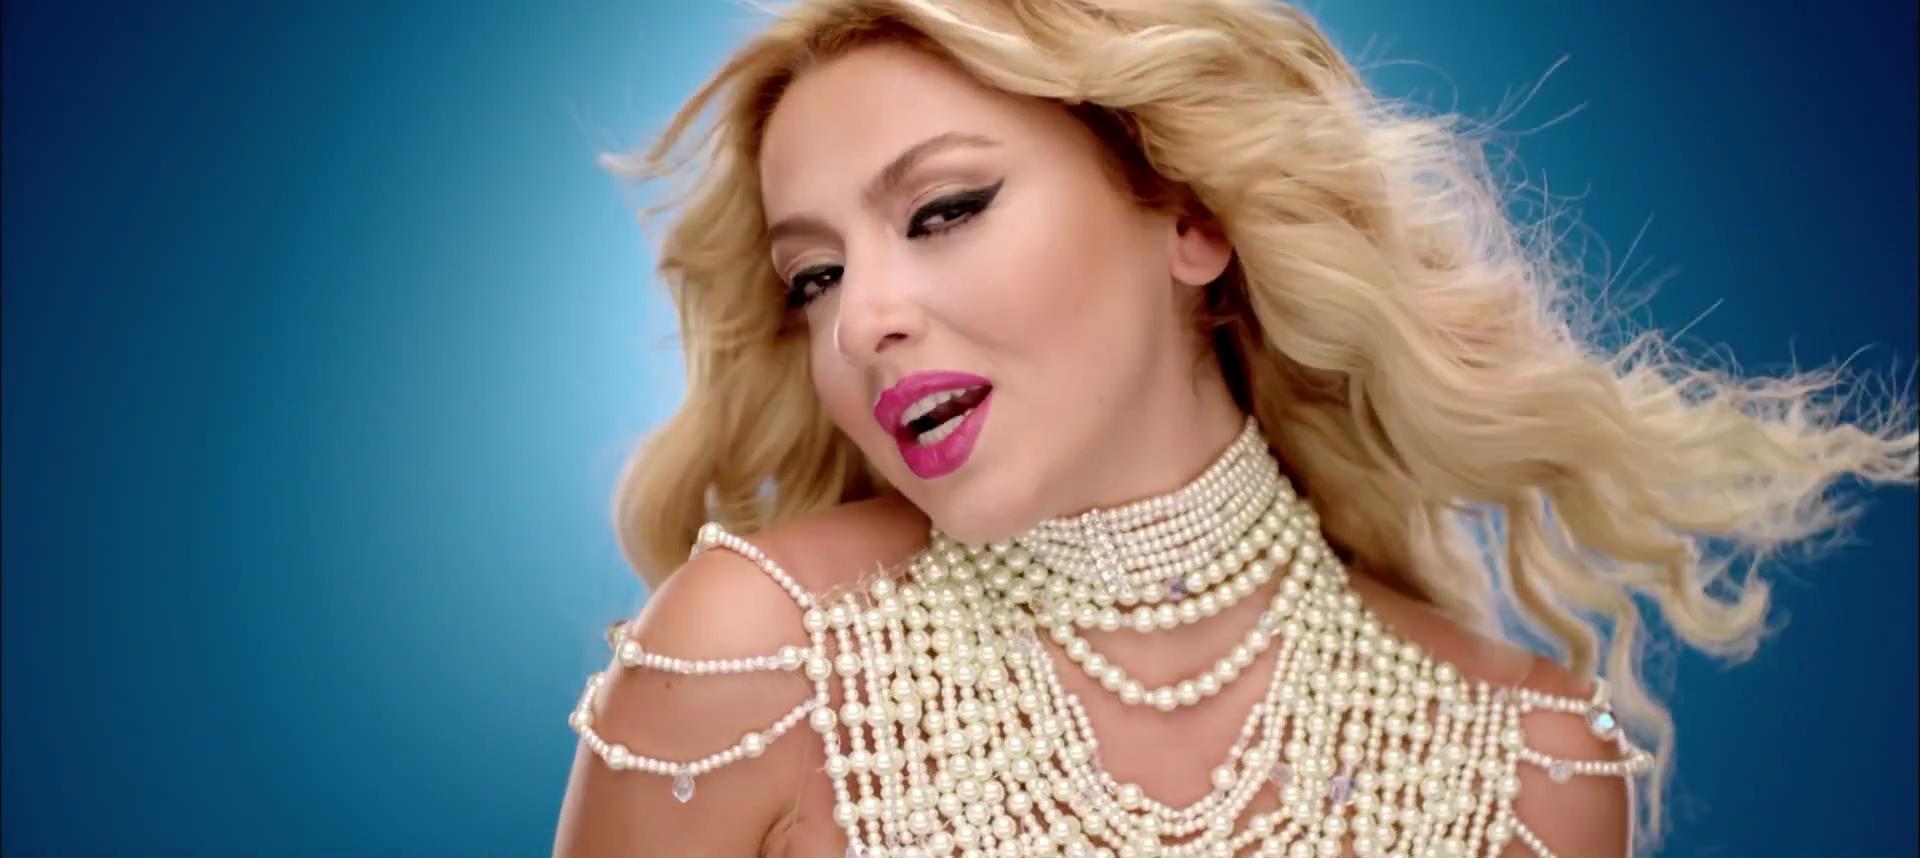 Türkçe Pop Müzik Mix 2016 Turkish House: Hadise Prenses - Google Search